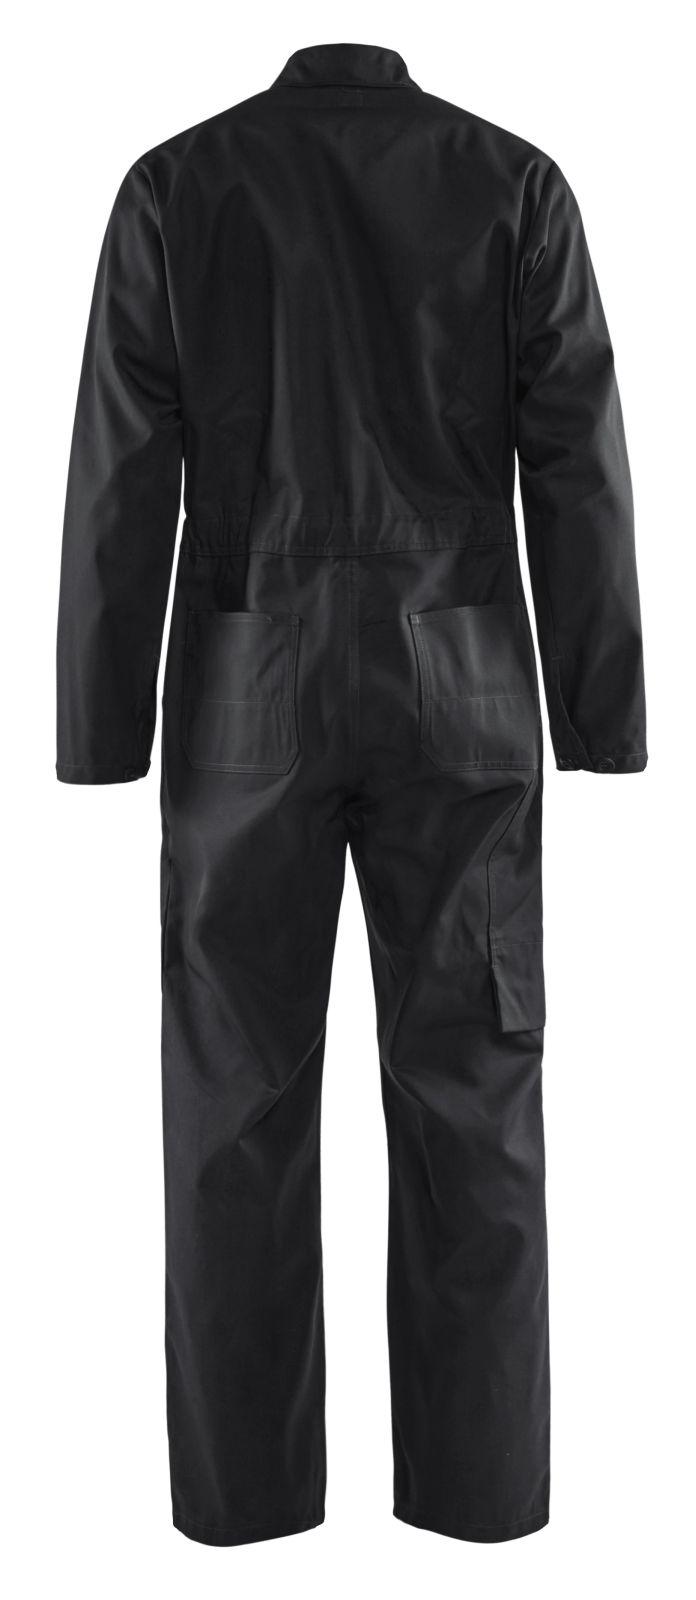 Blaklader Overalls 62701800 zwart(9900)